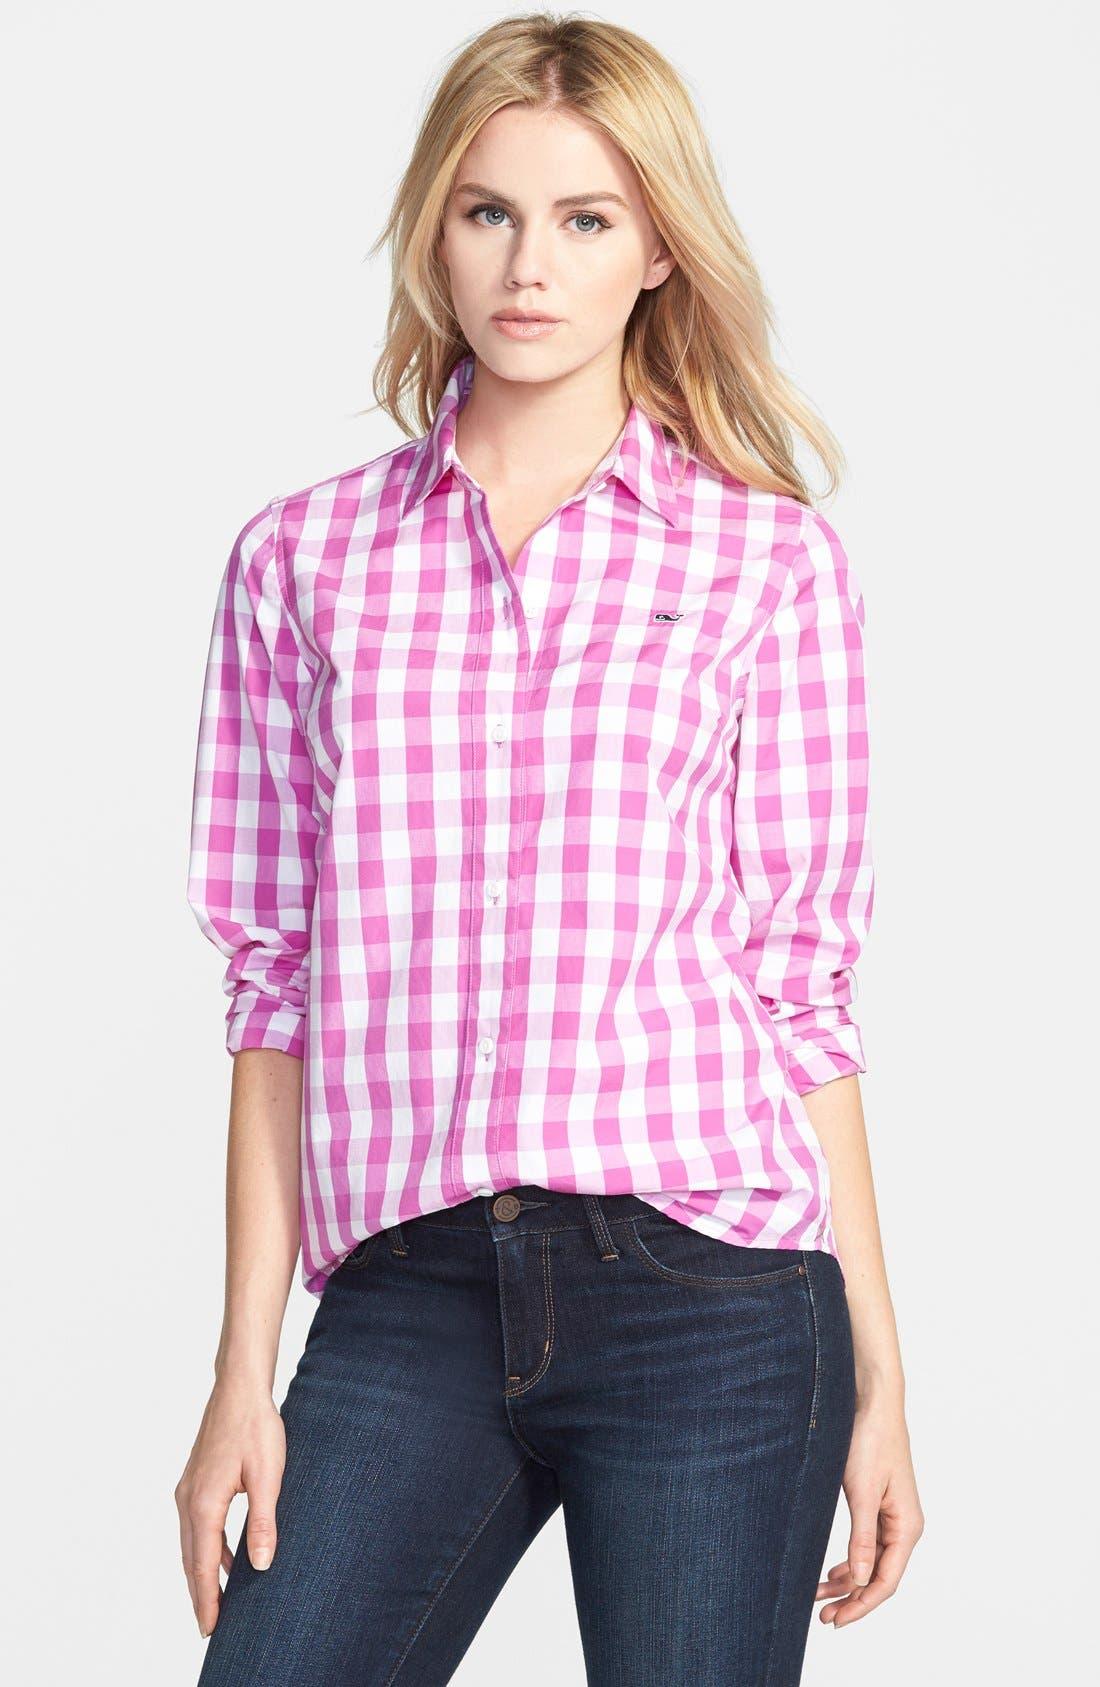 Alternate Image 1 Selected - Vineyard Vines Oversize Gingham Check Shirt